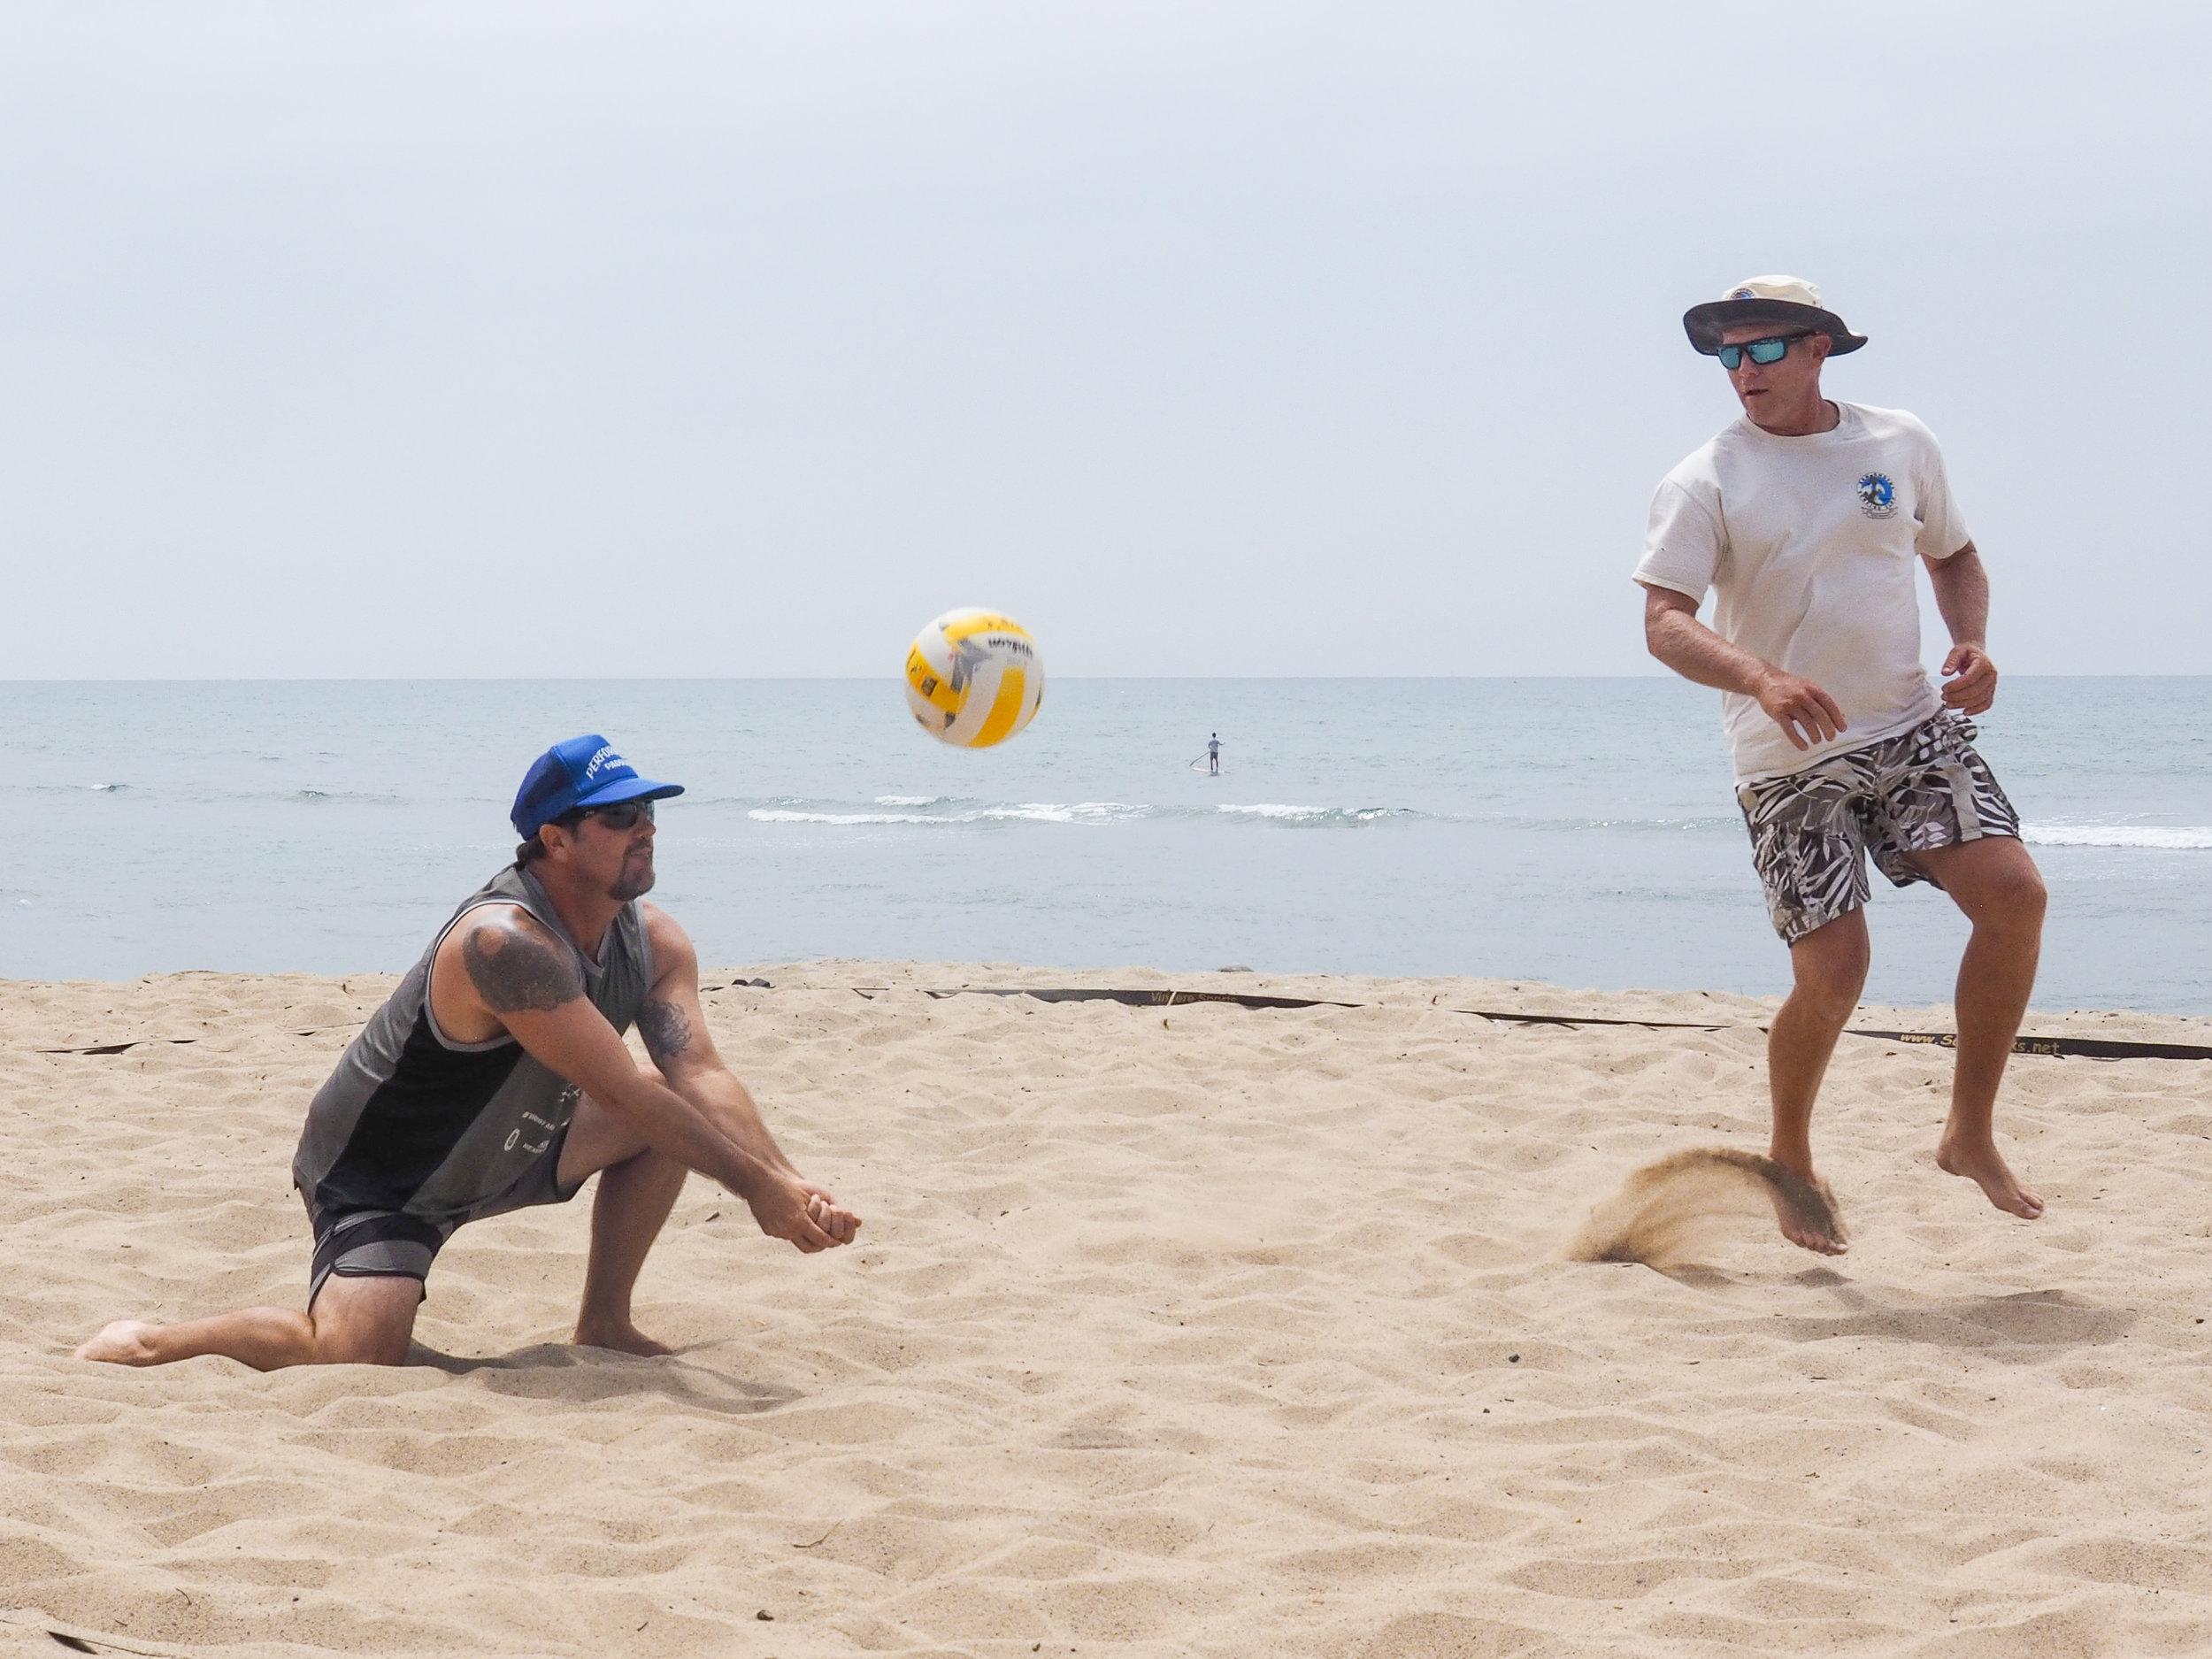 201808 vball beach SanO-55.jpg